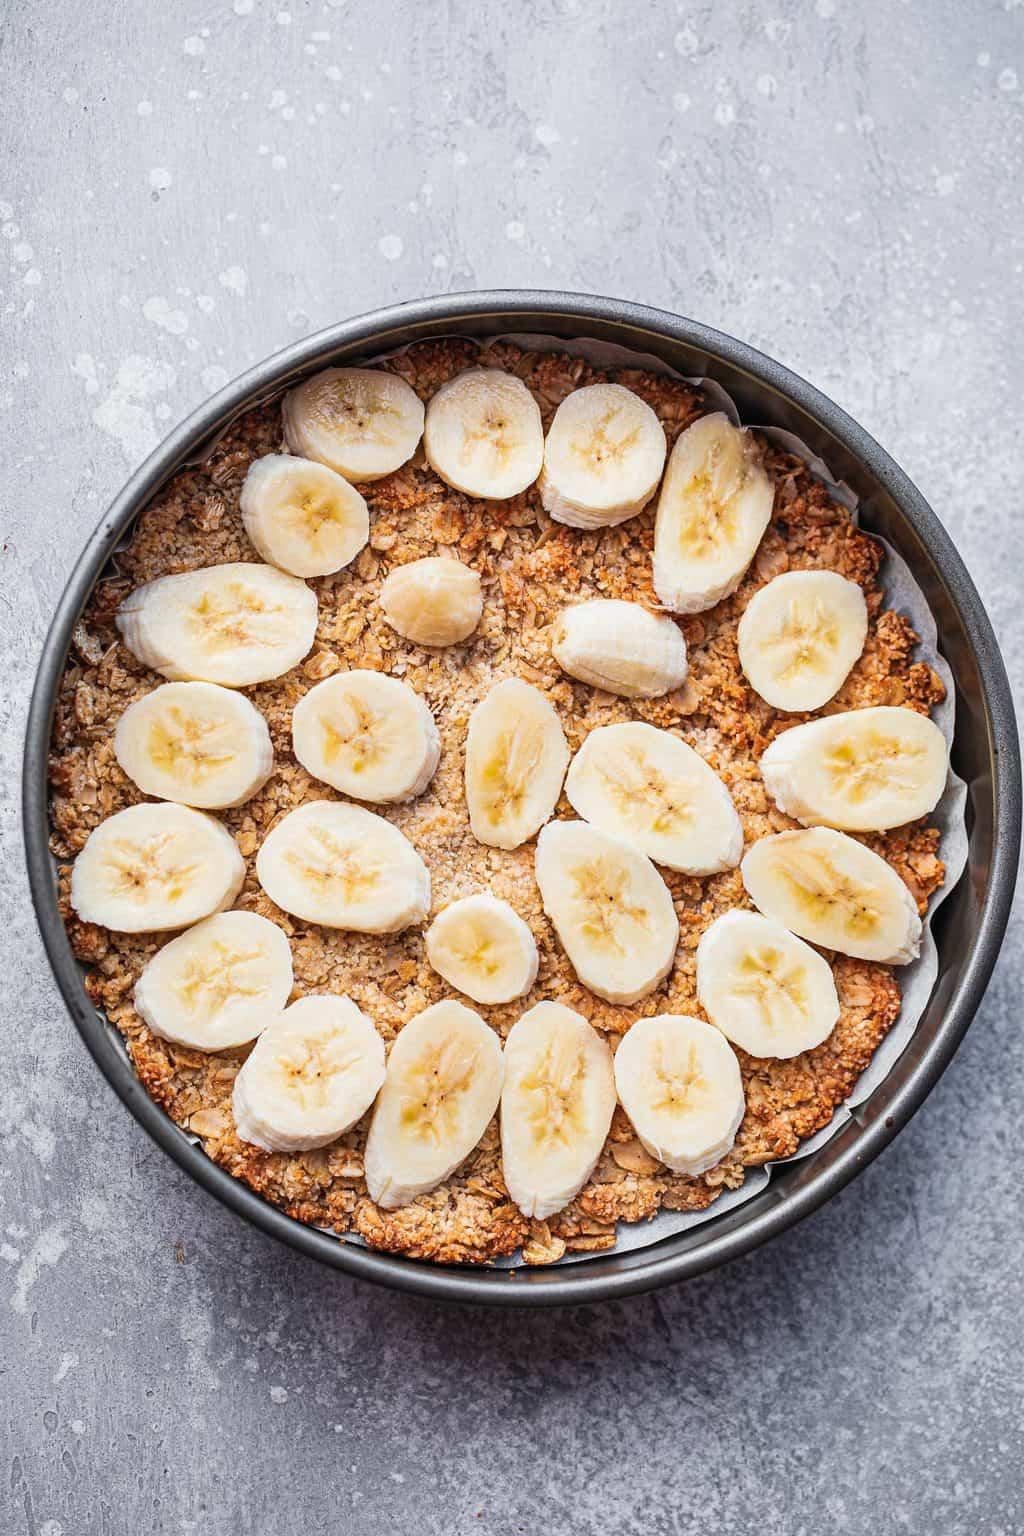 Vegan pie crust lined with bananas